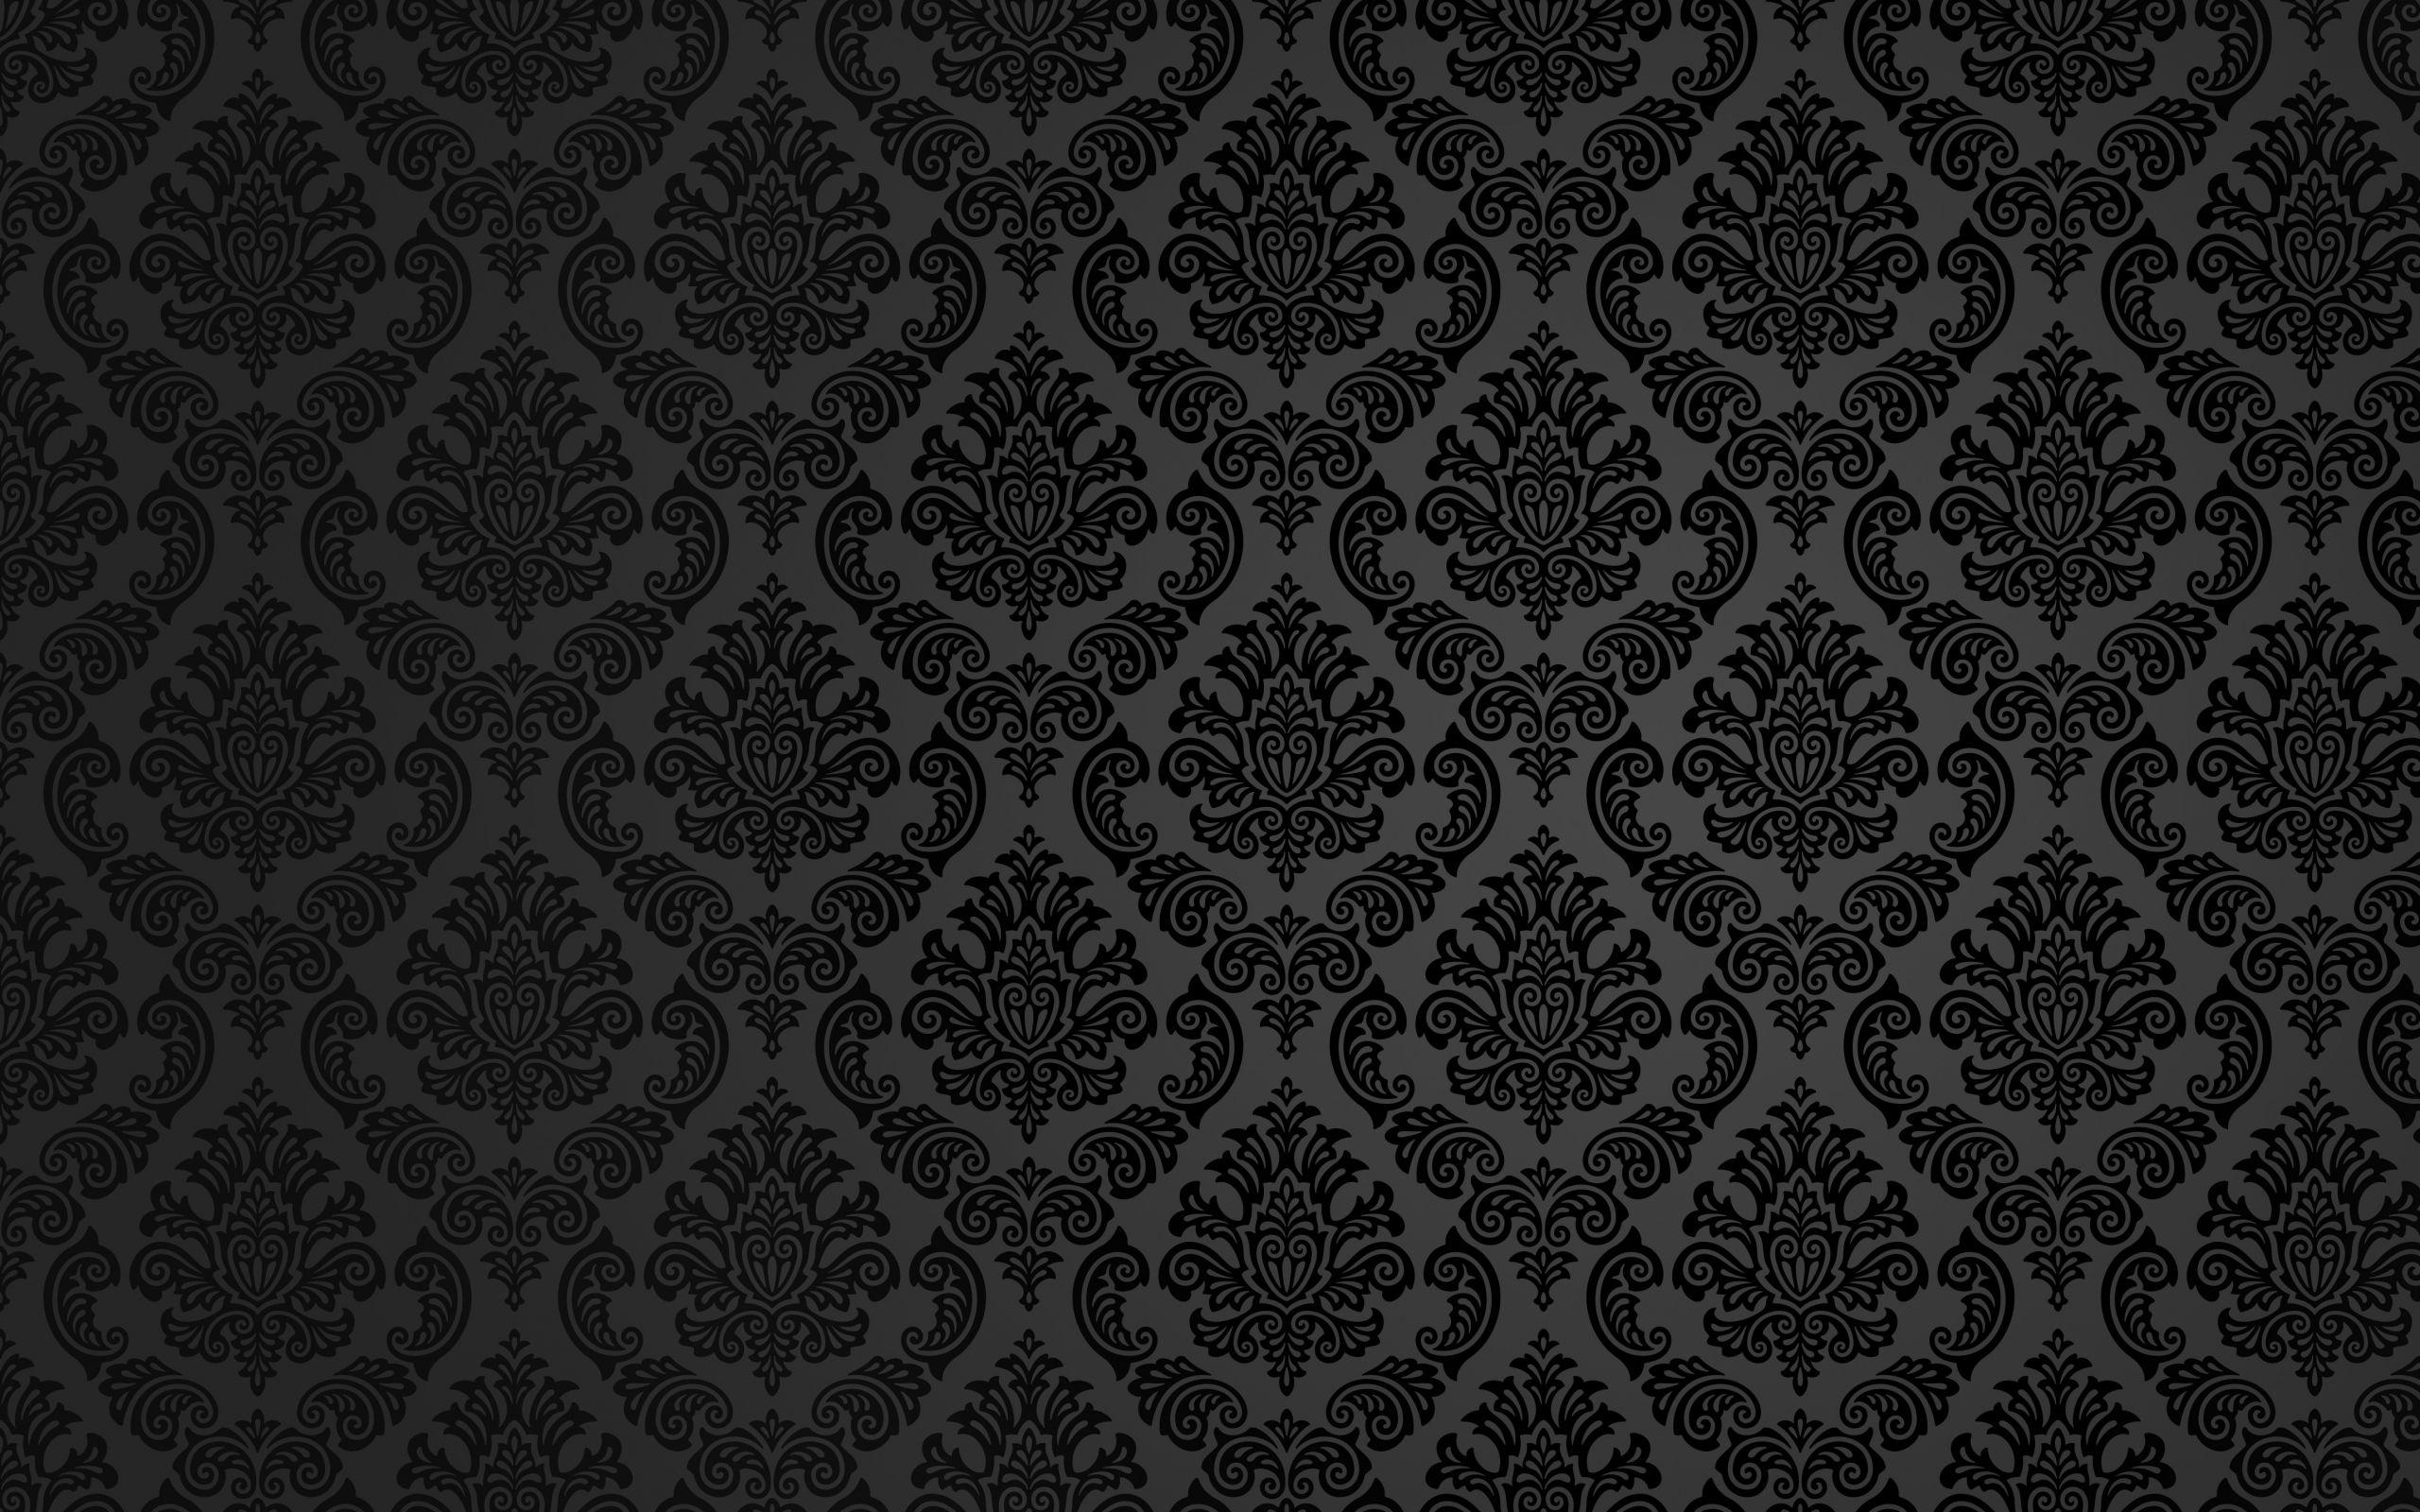 striped hd black grey pattern hd wallpapers wallpaper pinterest grey pattern hd wallpaper and wallpaper